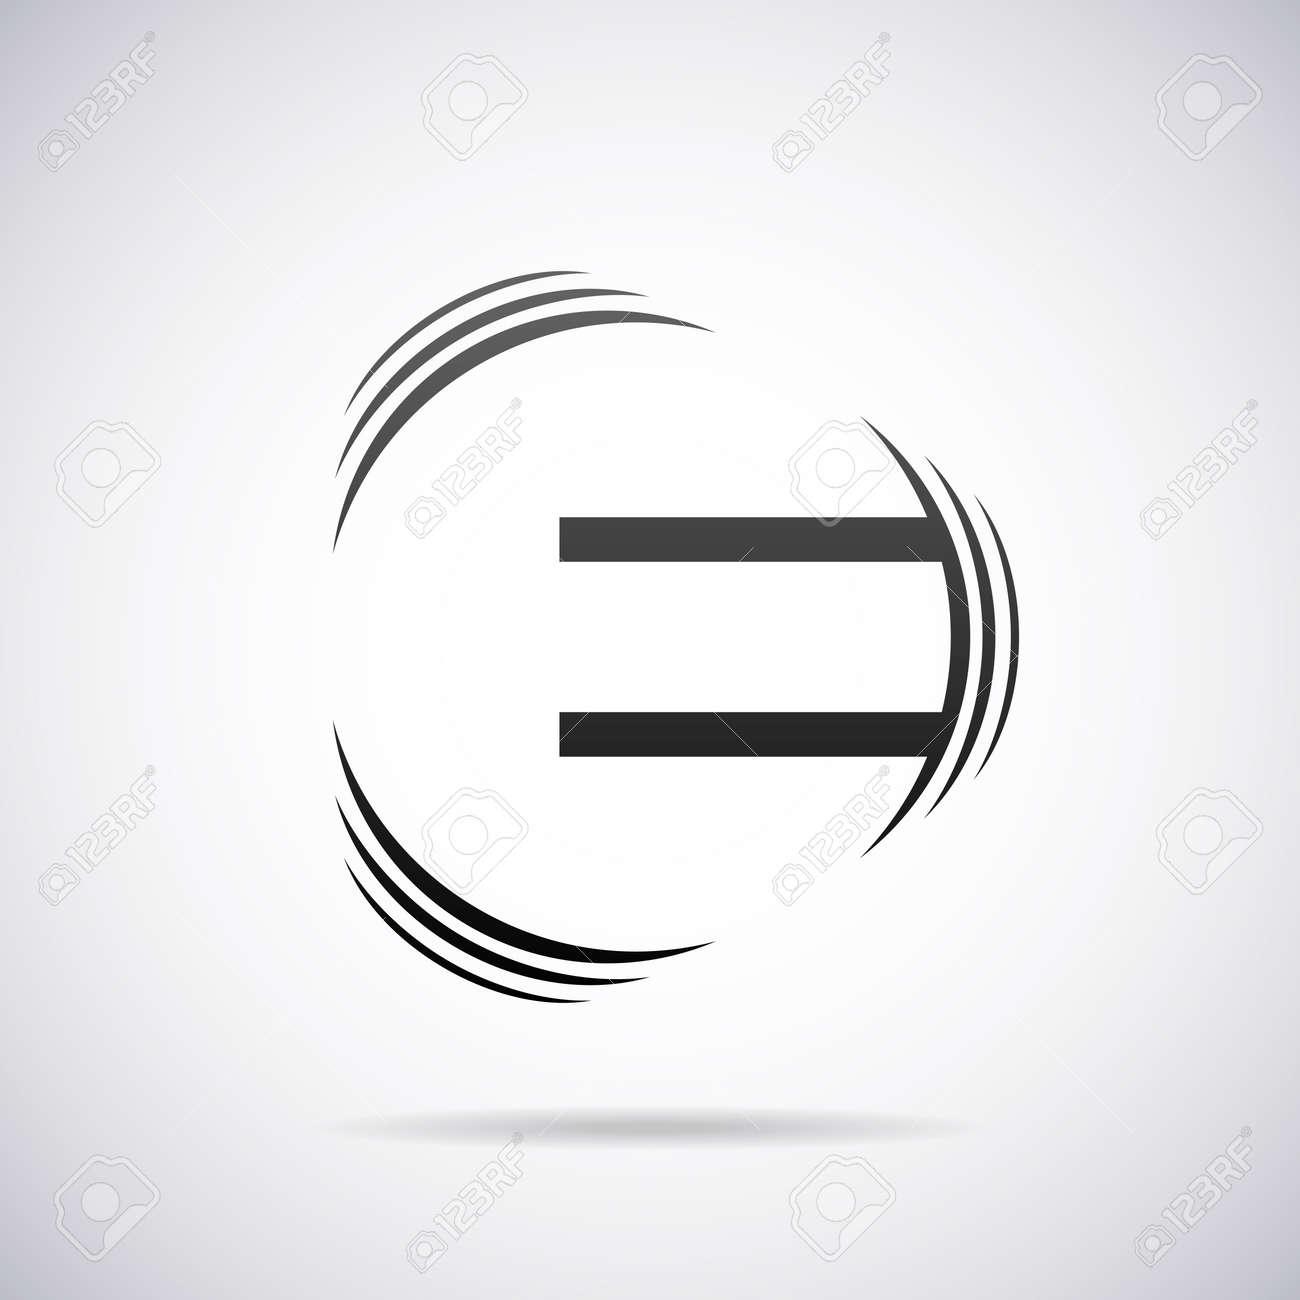 Logo for letter e design template vector illustration royalty free logo for letter e design template vector illustration stock vector 40315957 spiritdancerdesigns Images